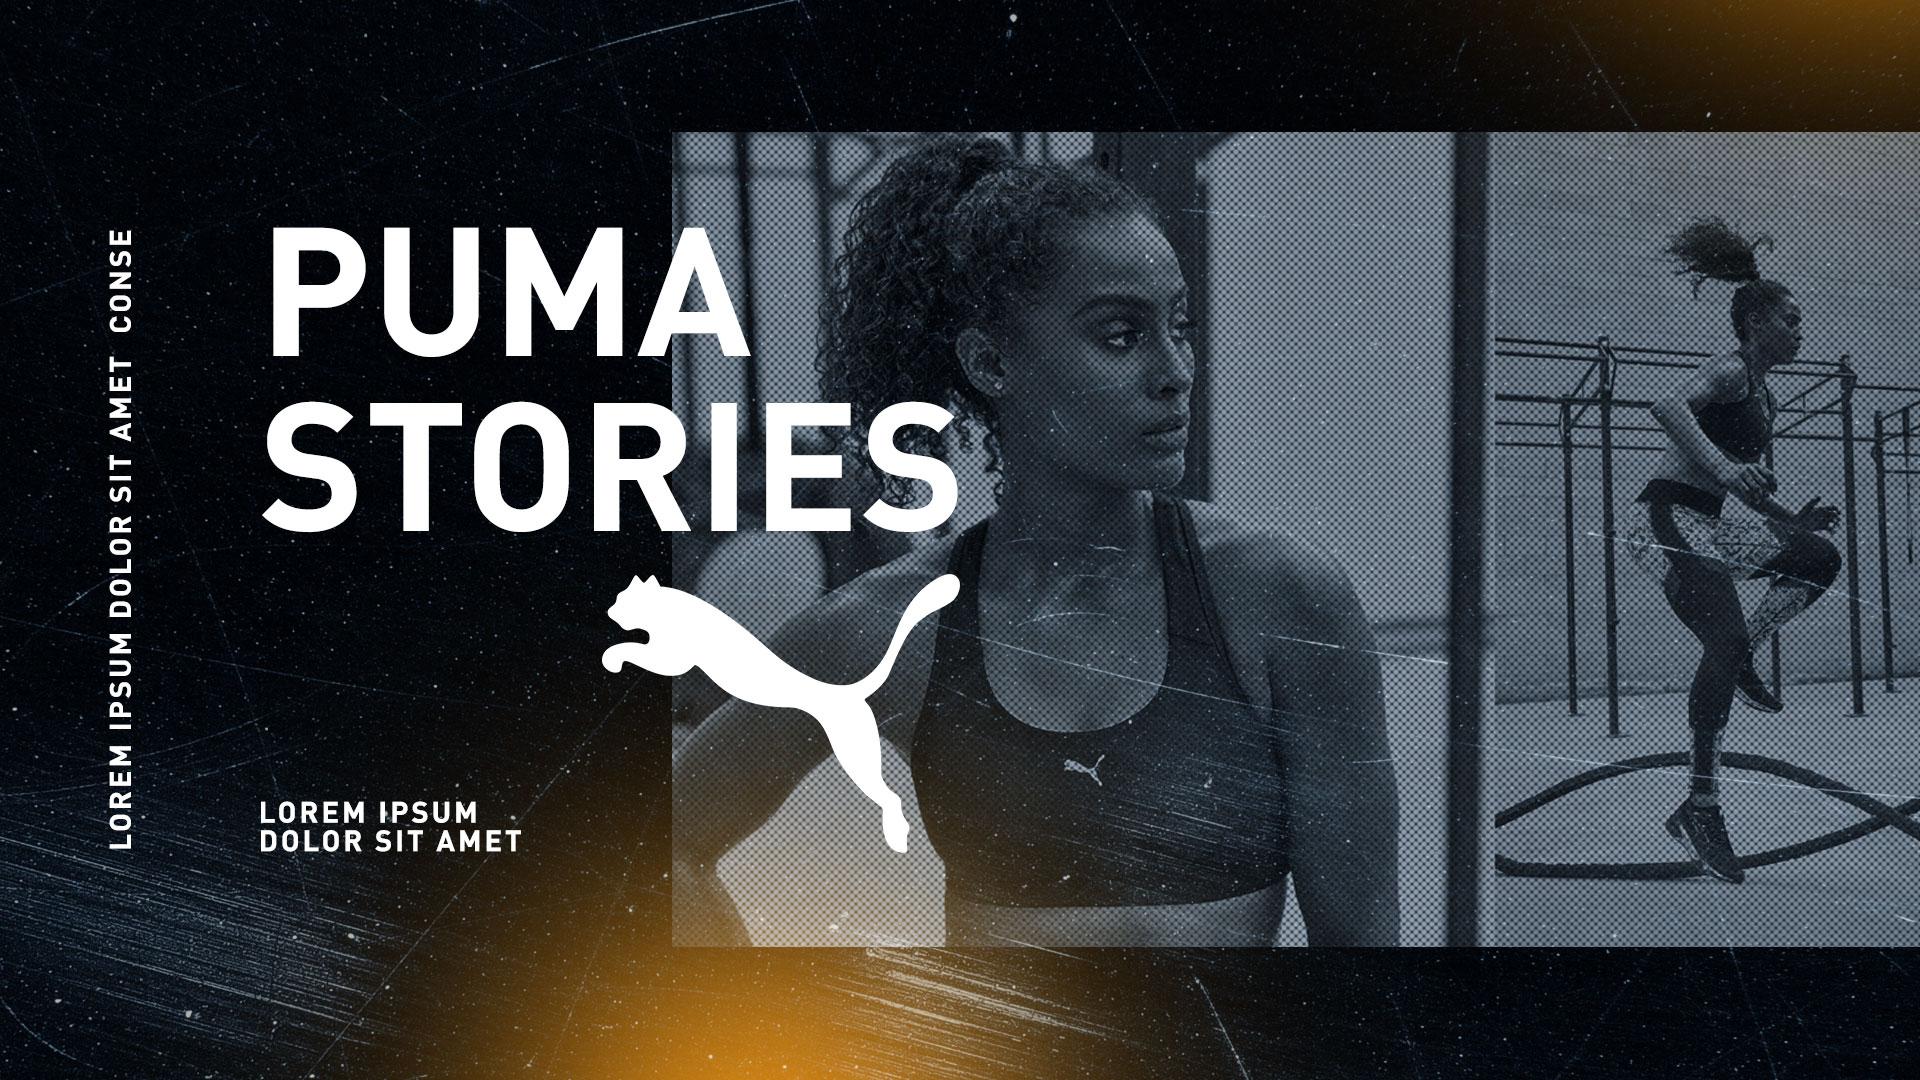 Puma Stories pitch deck